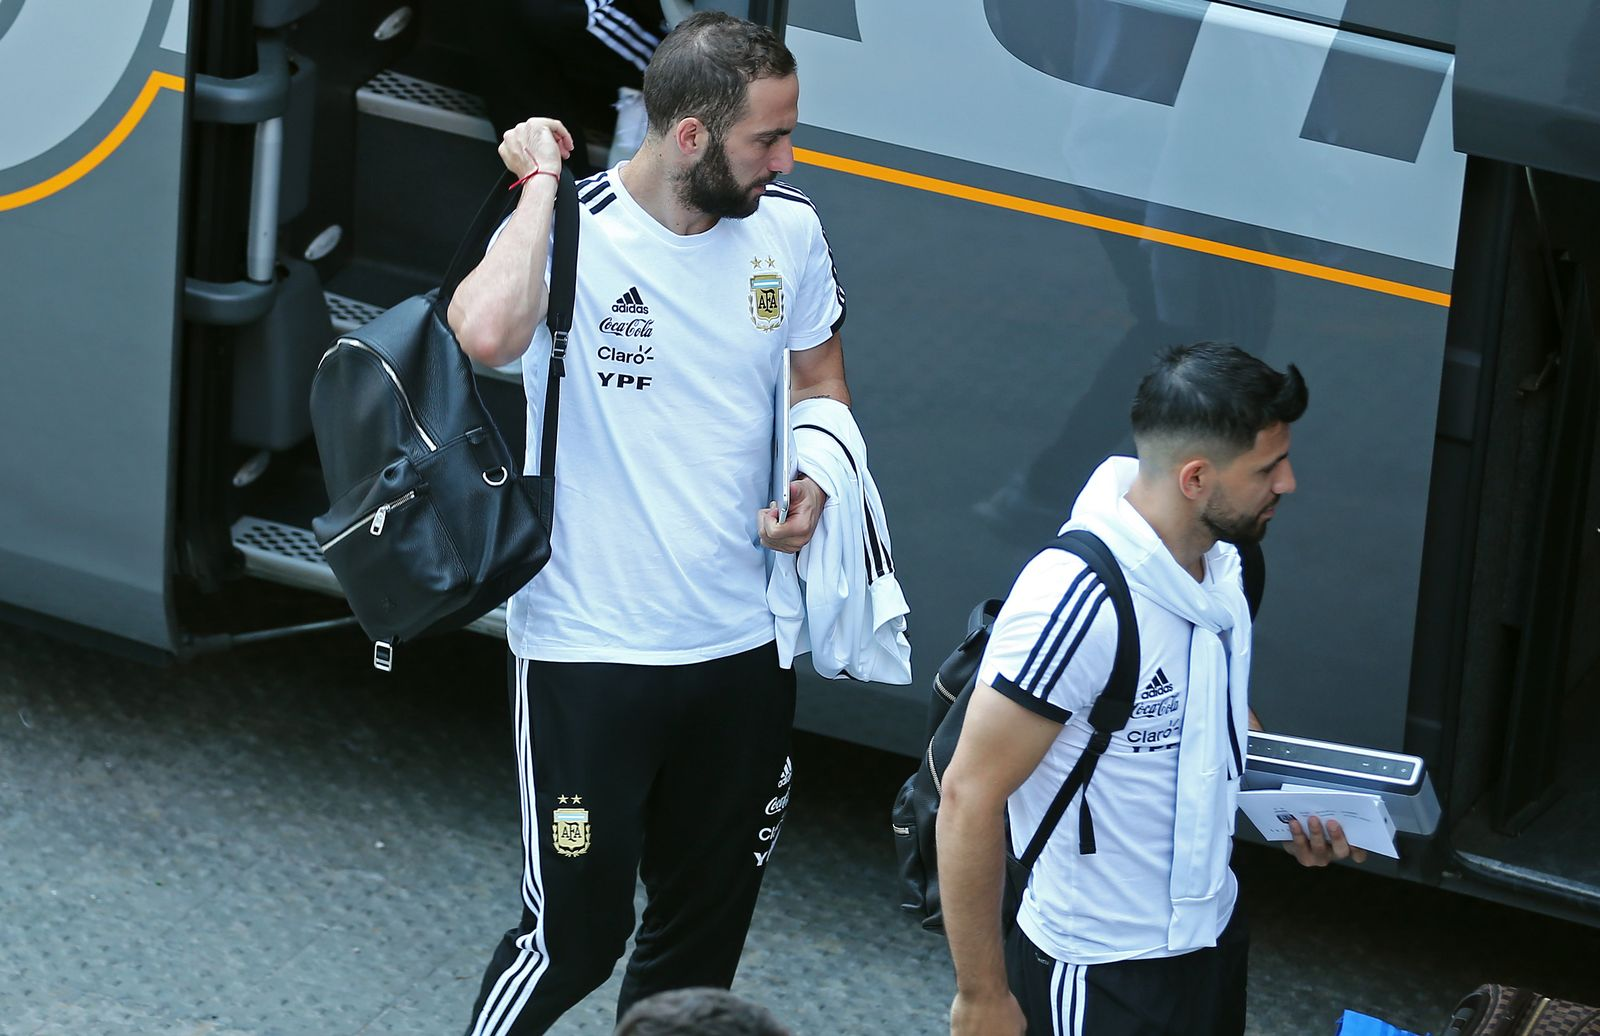 Argentina National team, in Barcelona